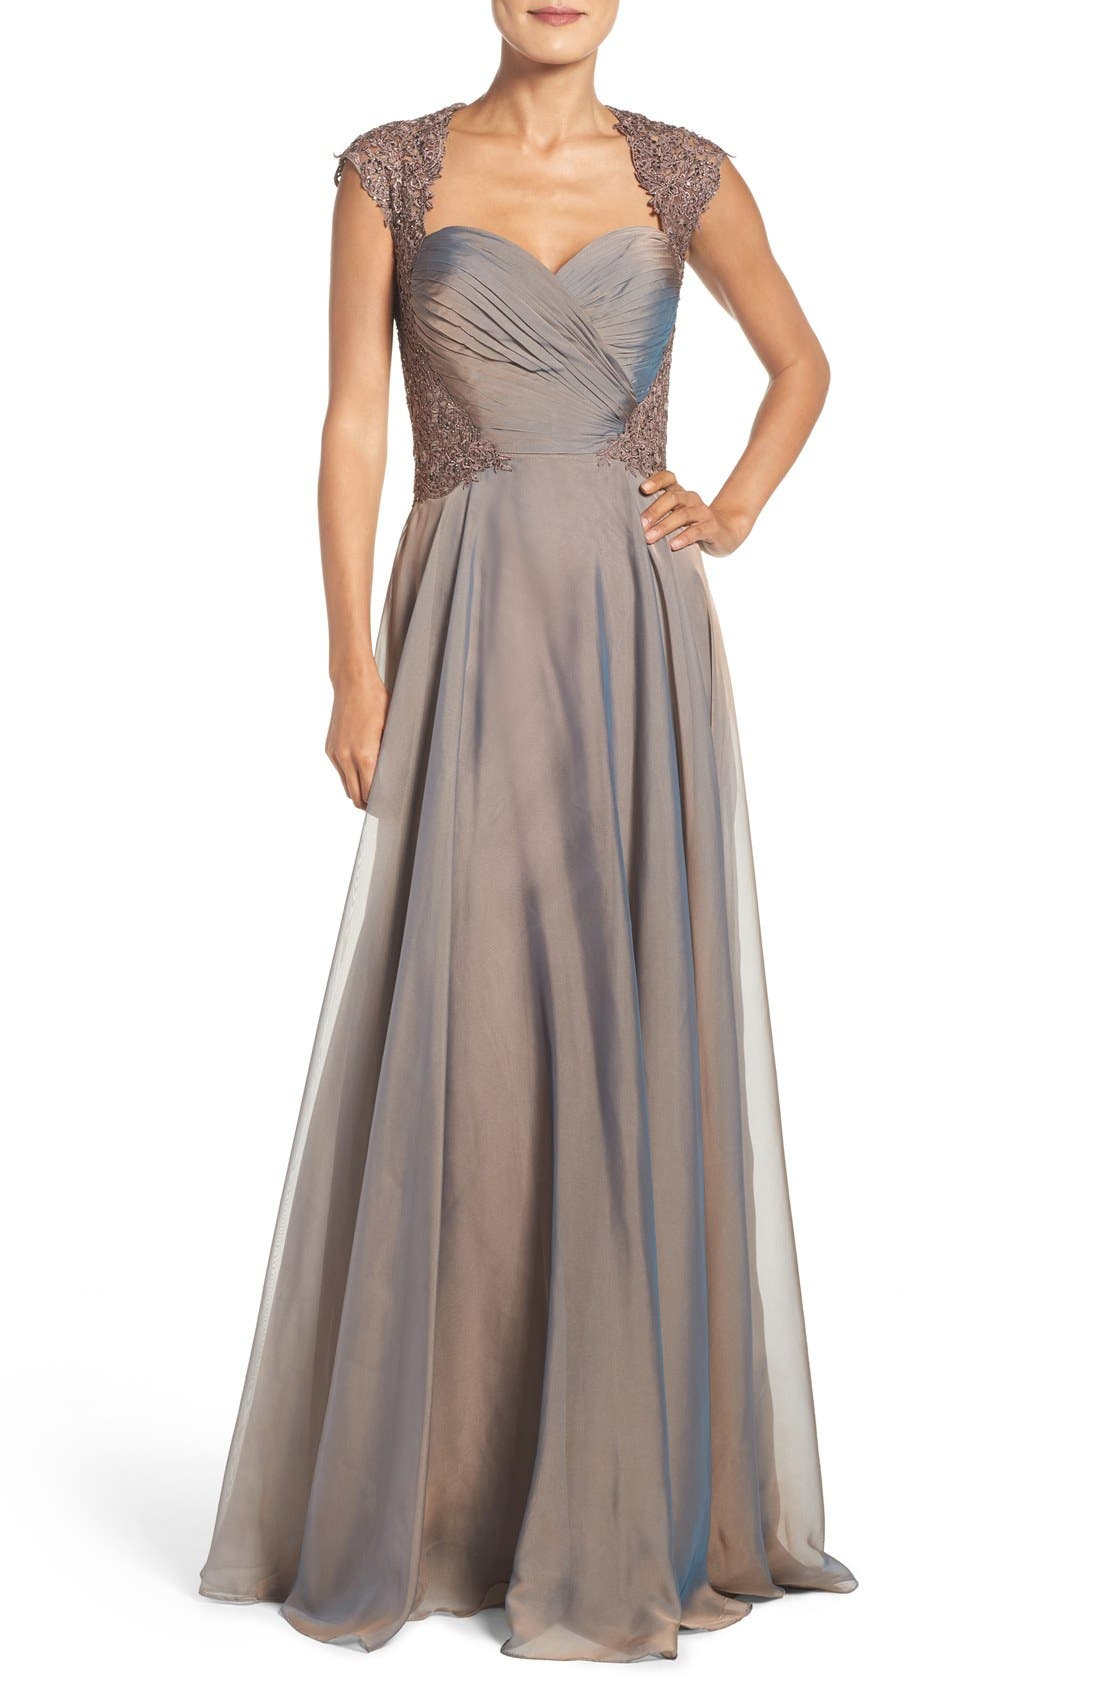 LA FEMME, Ruched Chiffon Gown, Main thumbnail 1, color, COCOA